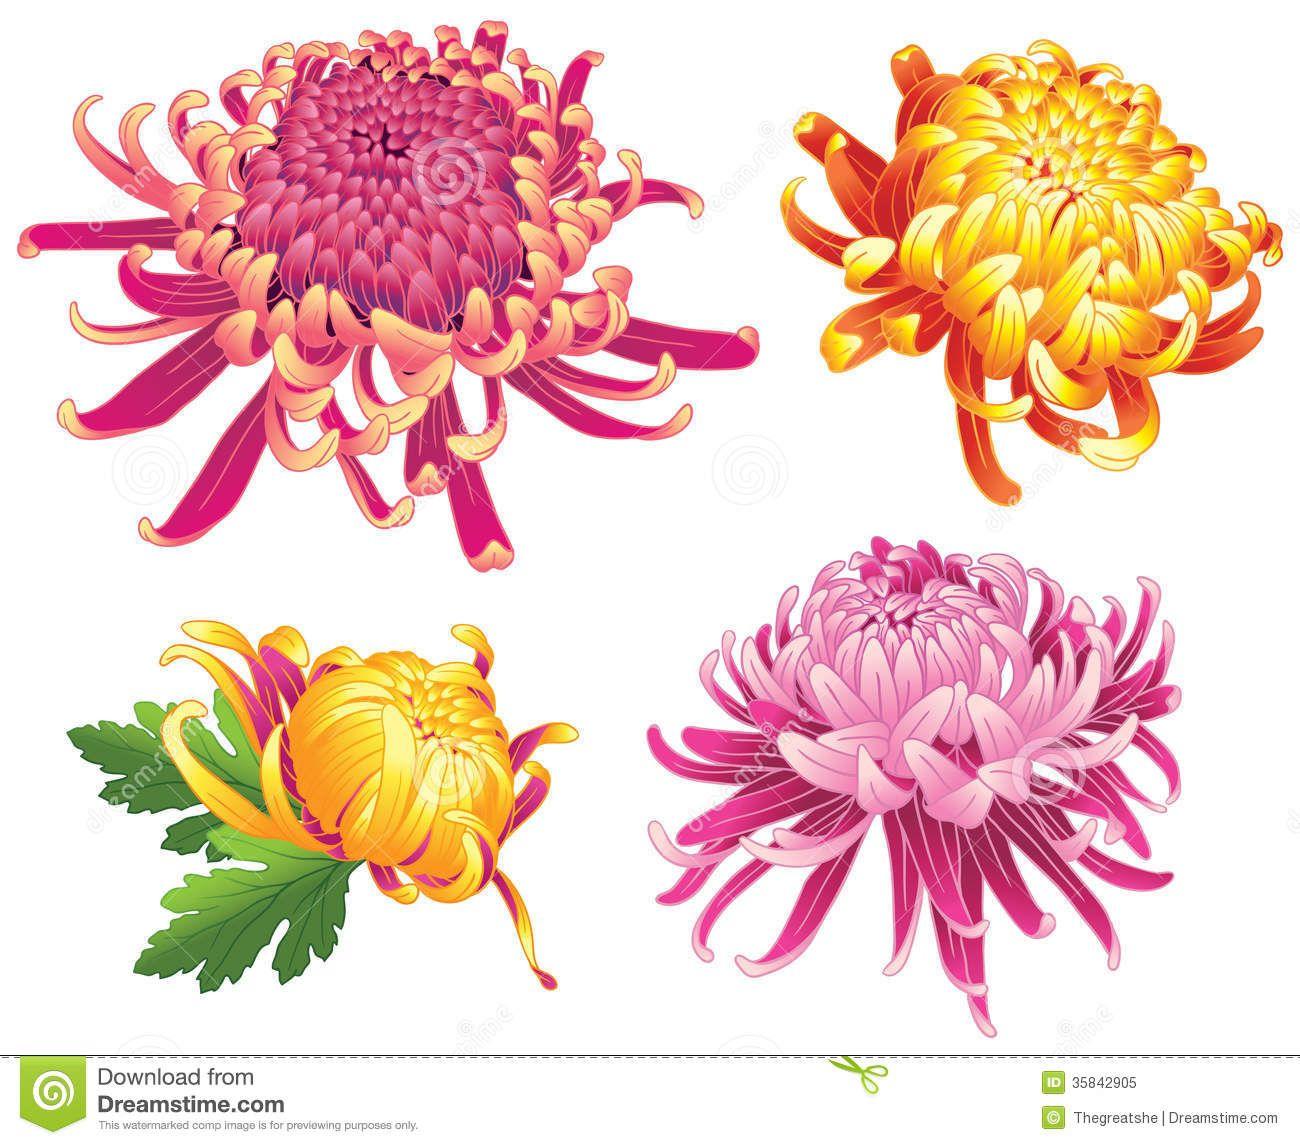 Chrysanthemum Flower Blossoms Color Royalty Free Stock Photo Image 35842905 Chrysanthemum Flower Chrysanthemum Drawing Chrysanthemum Tattoo